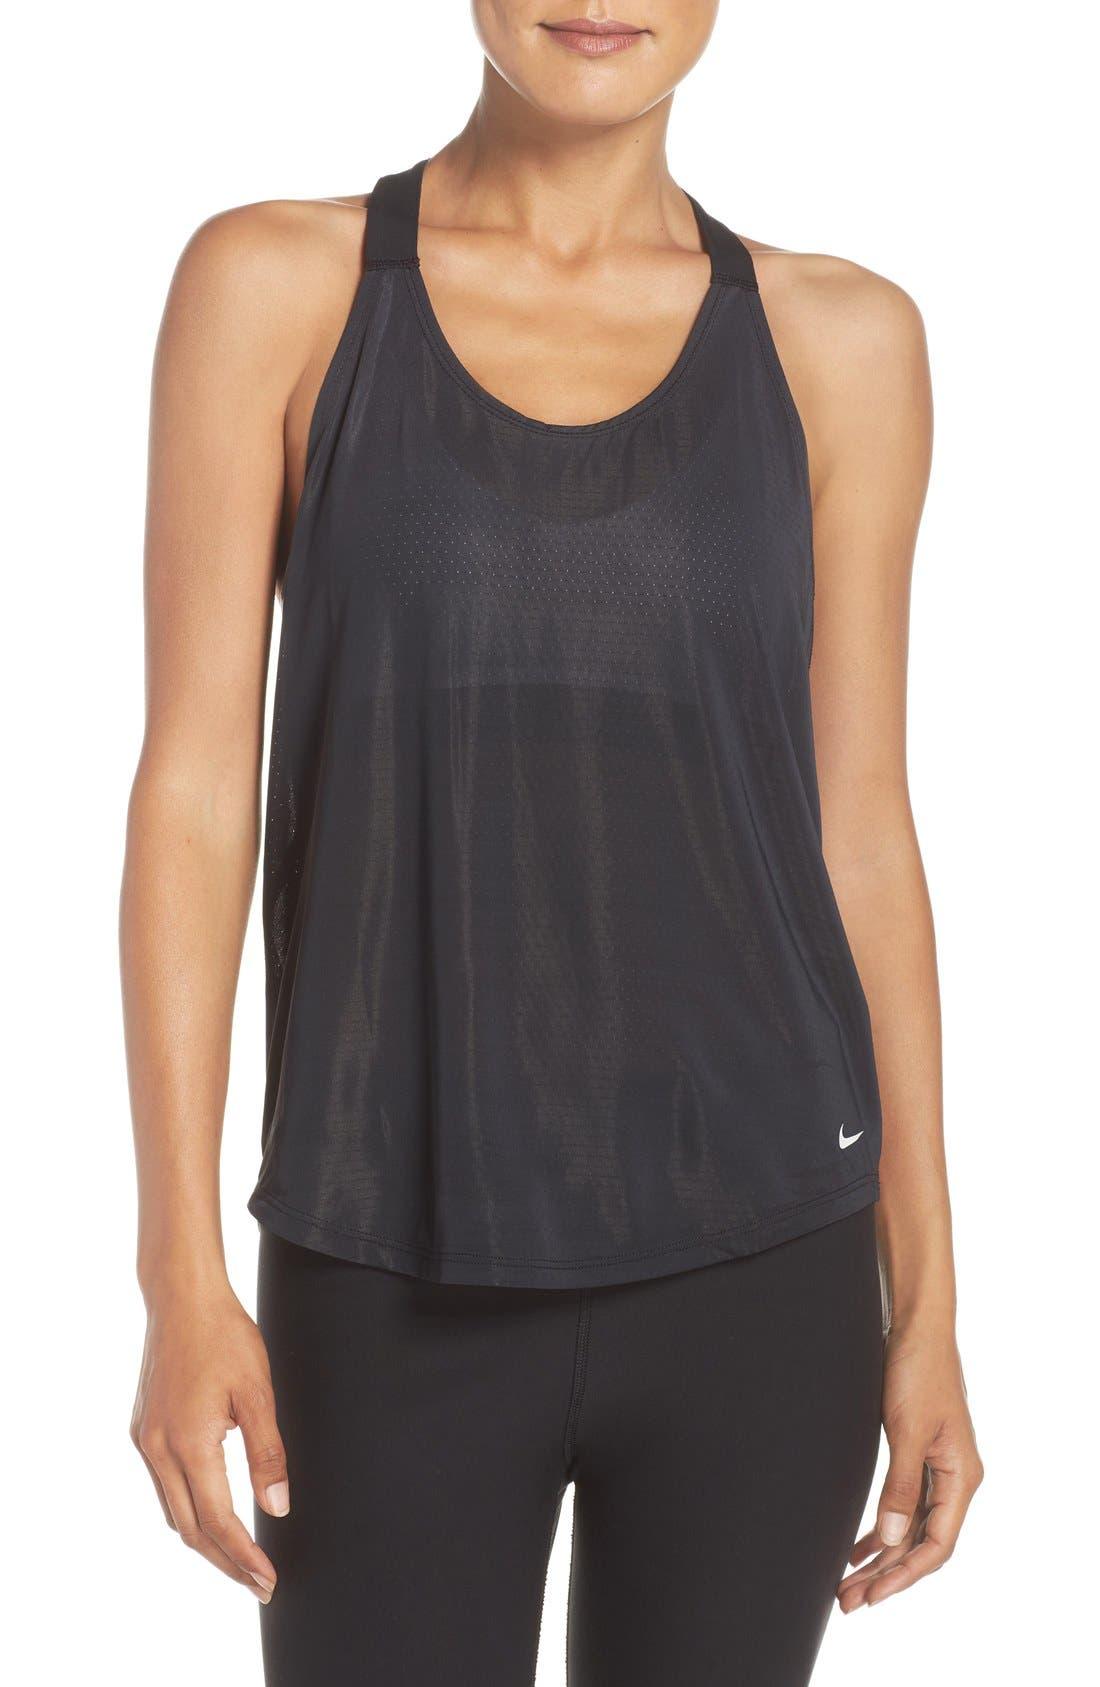 Main Image - Nike 'Elevate' Racerback Dri-FIT Tank (Regular Retail Price: $40.00)